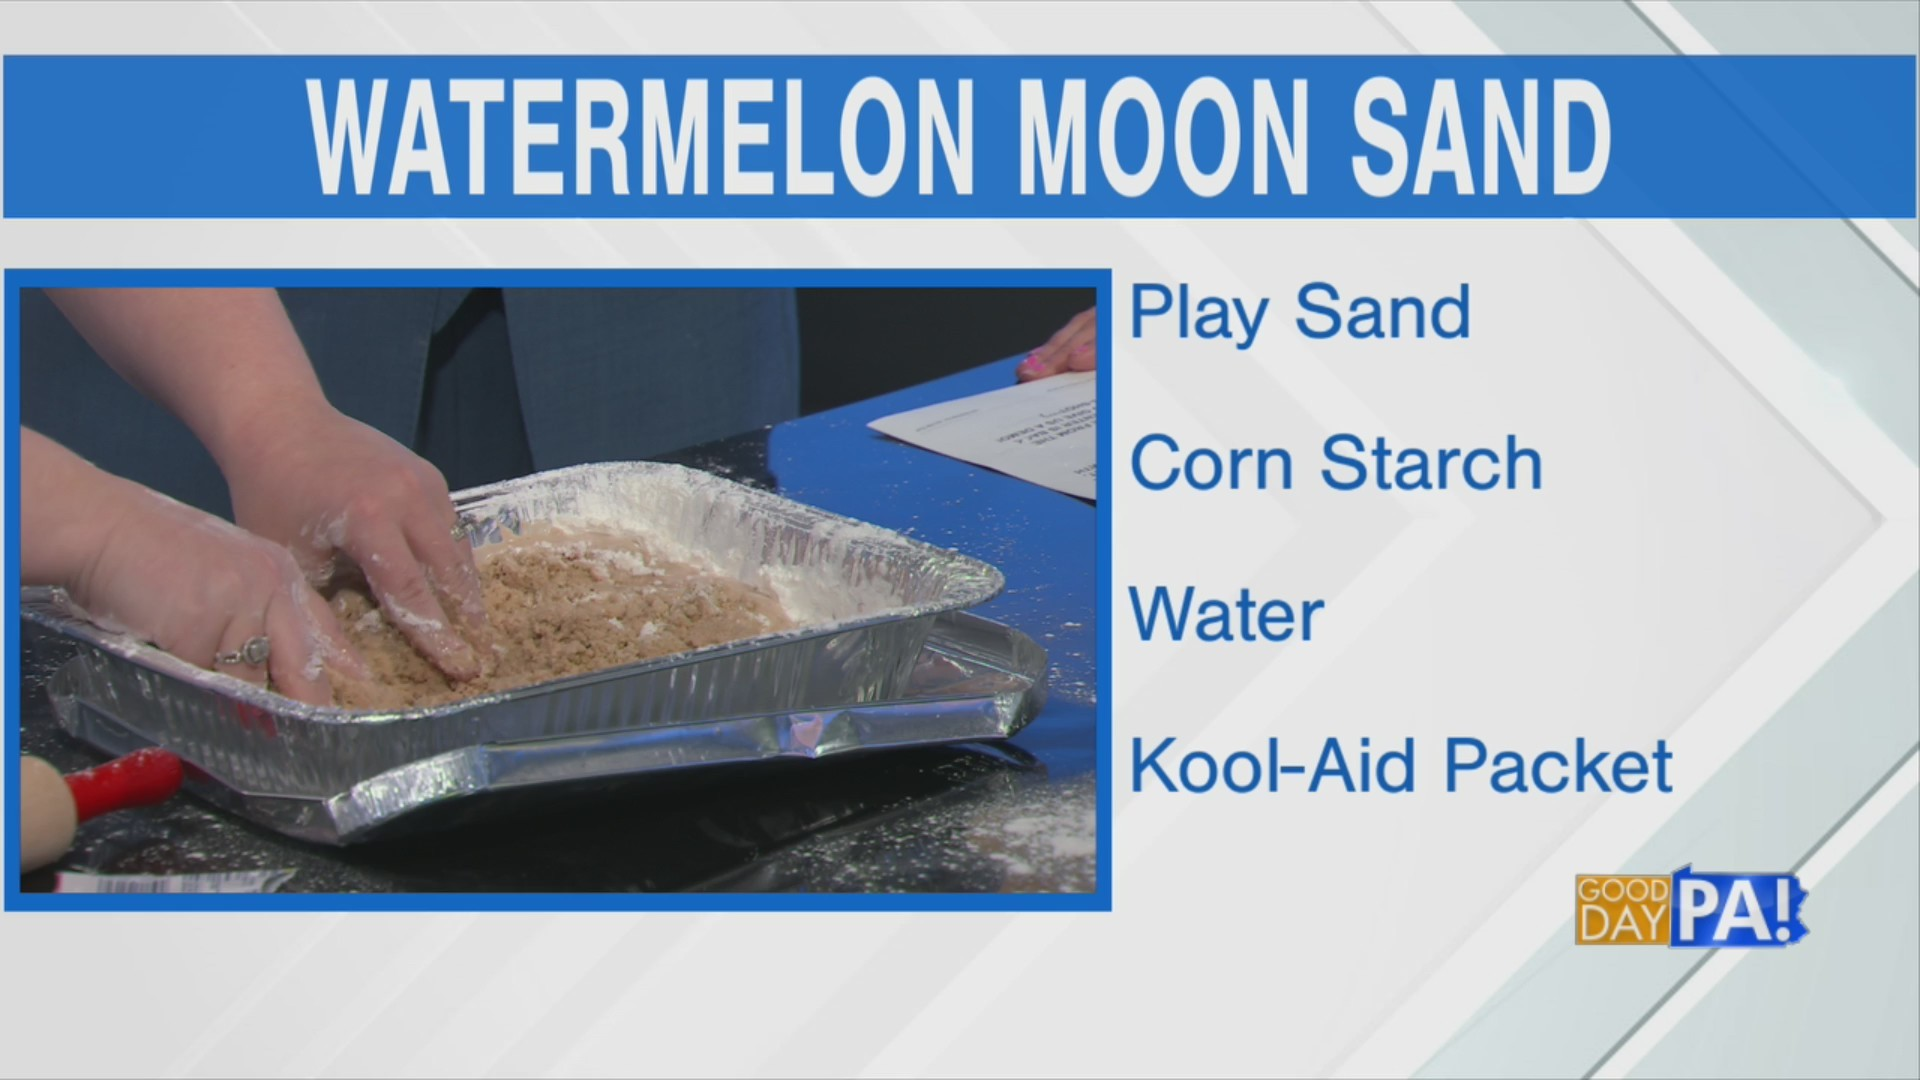 Watermelon Moon Sand